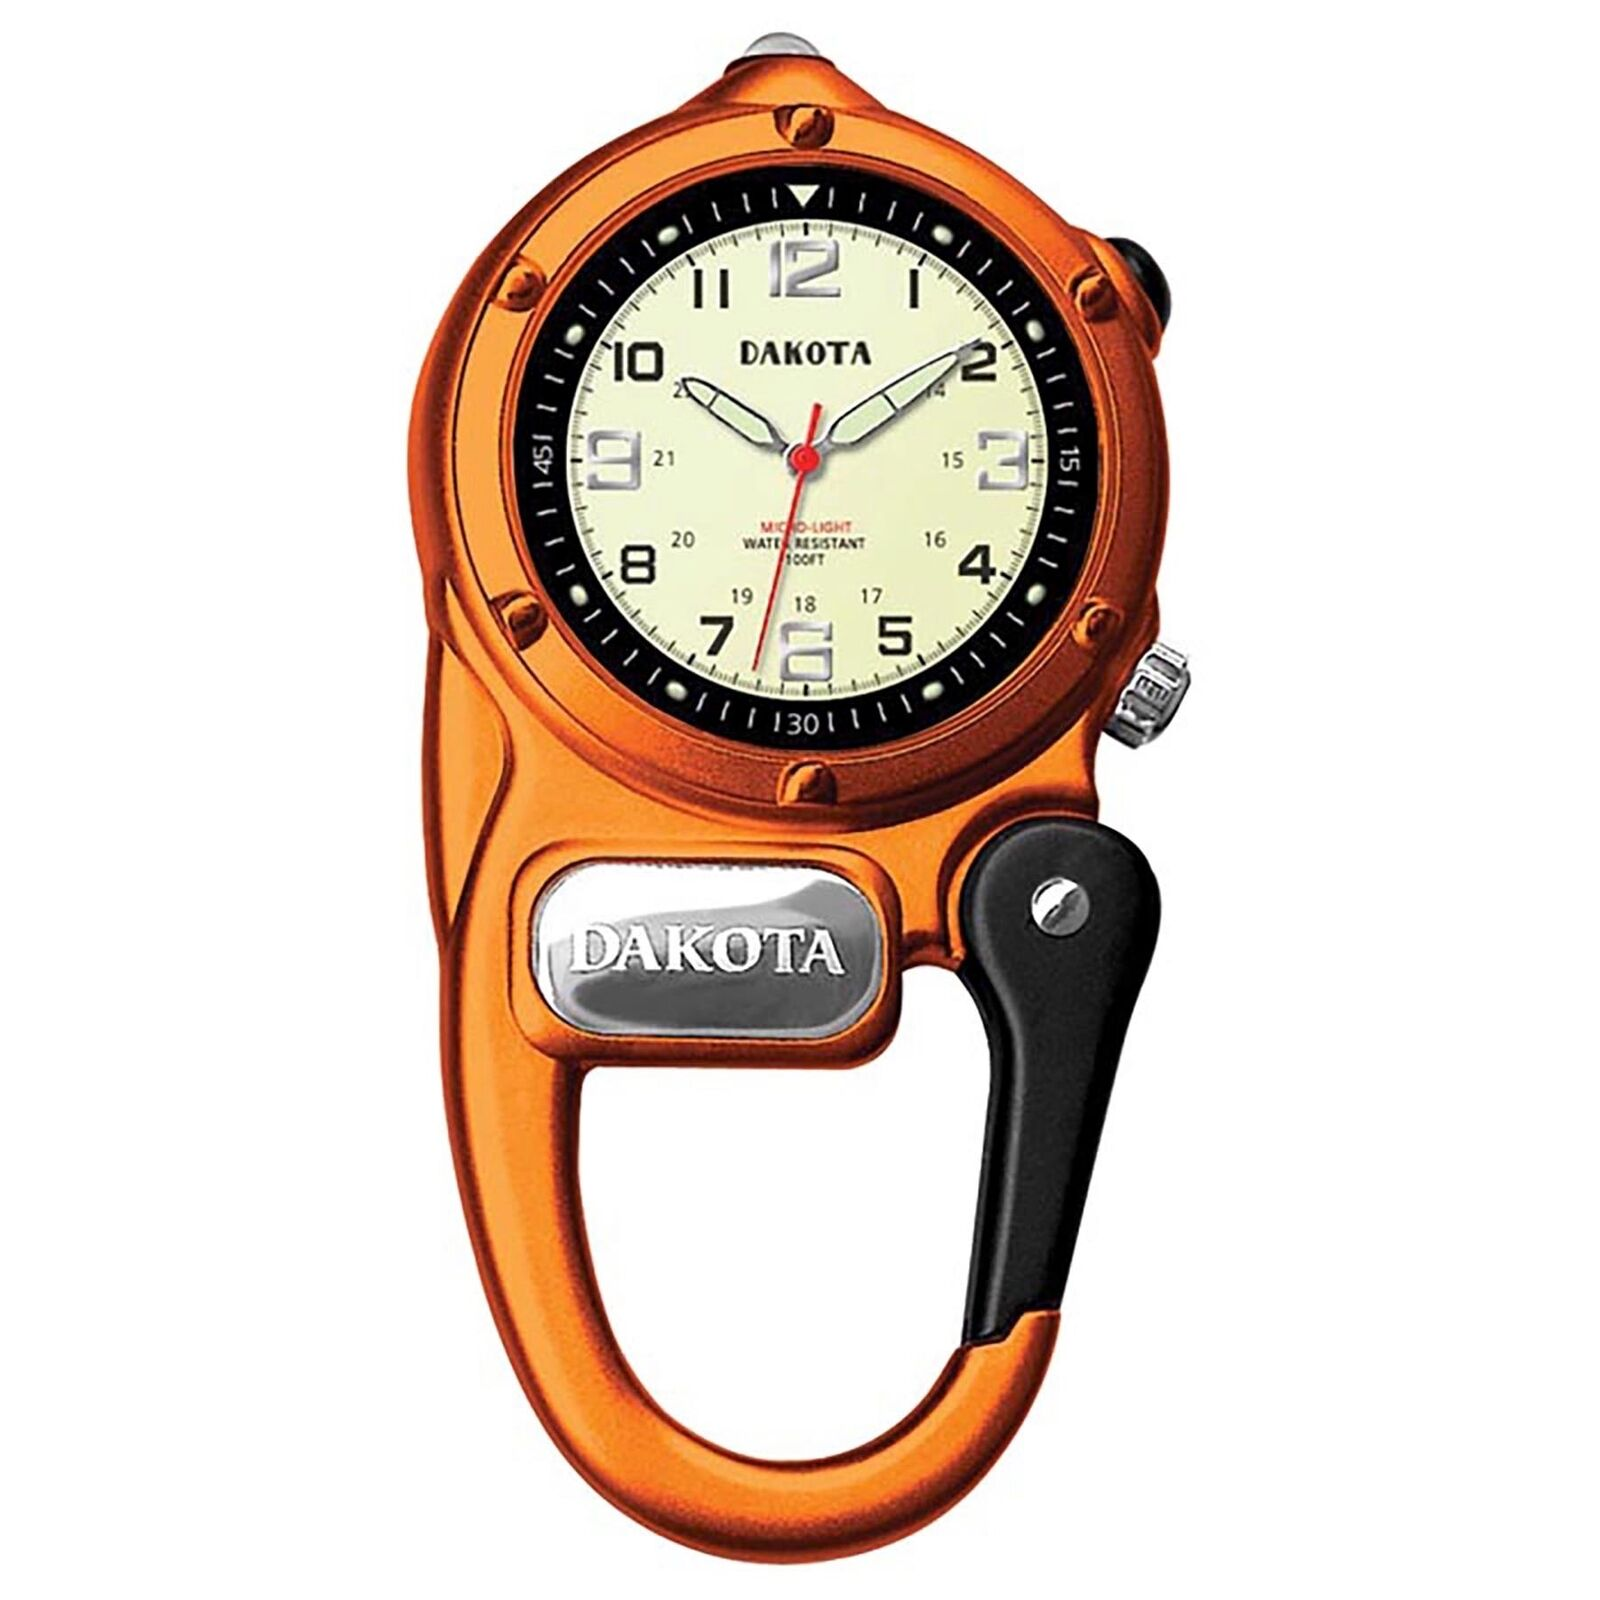 Dakota Watch Company Mini Clip Microlight Watch Orange Water Resistant LED Light